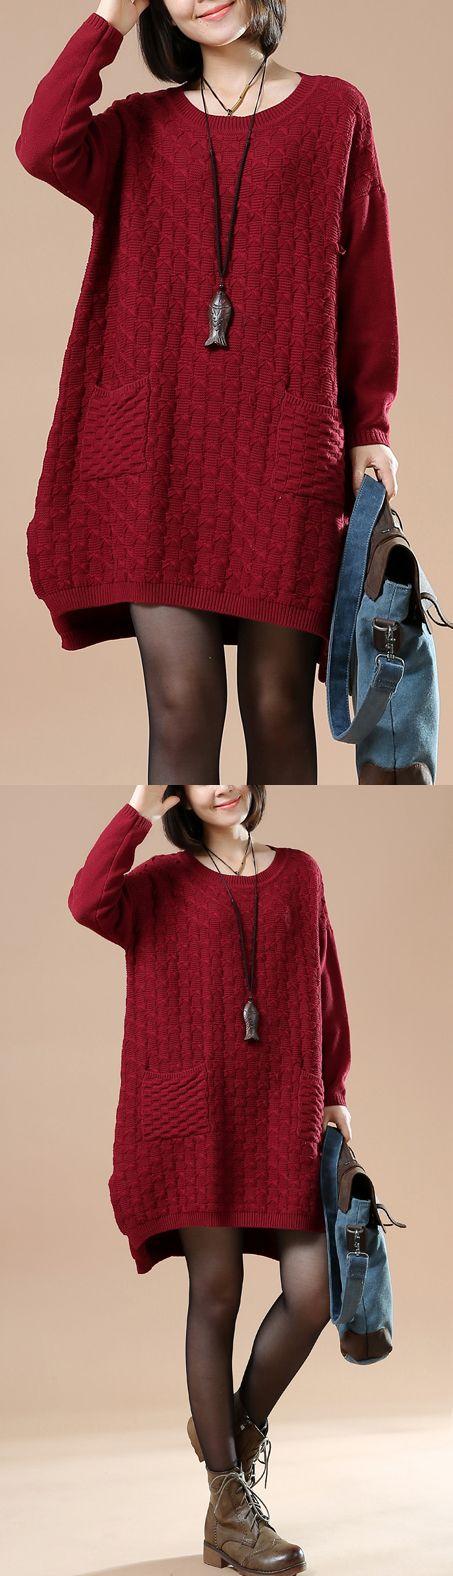 Burgundy cute sweater dresses witner knit pullover